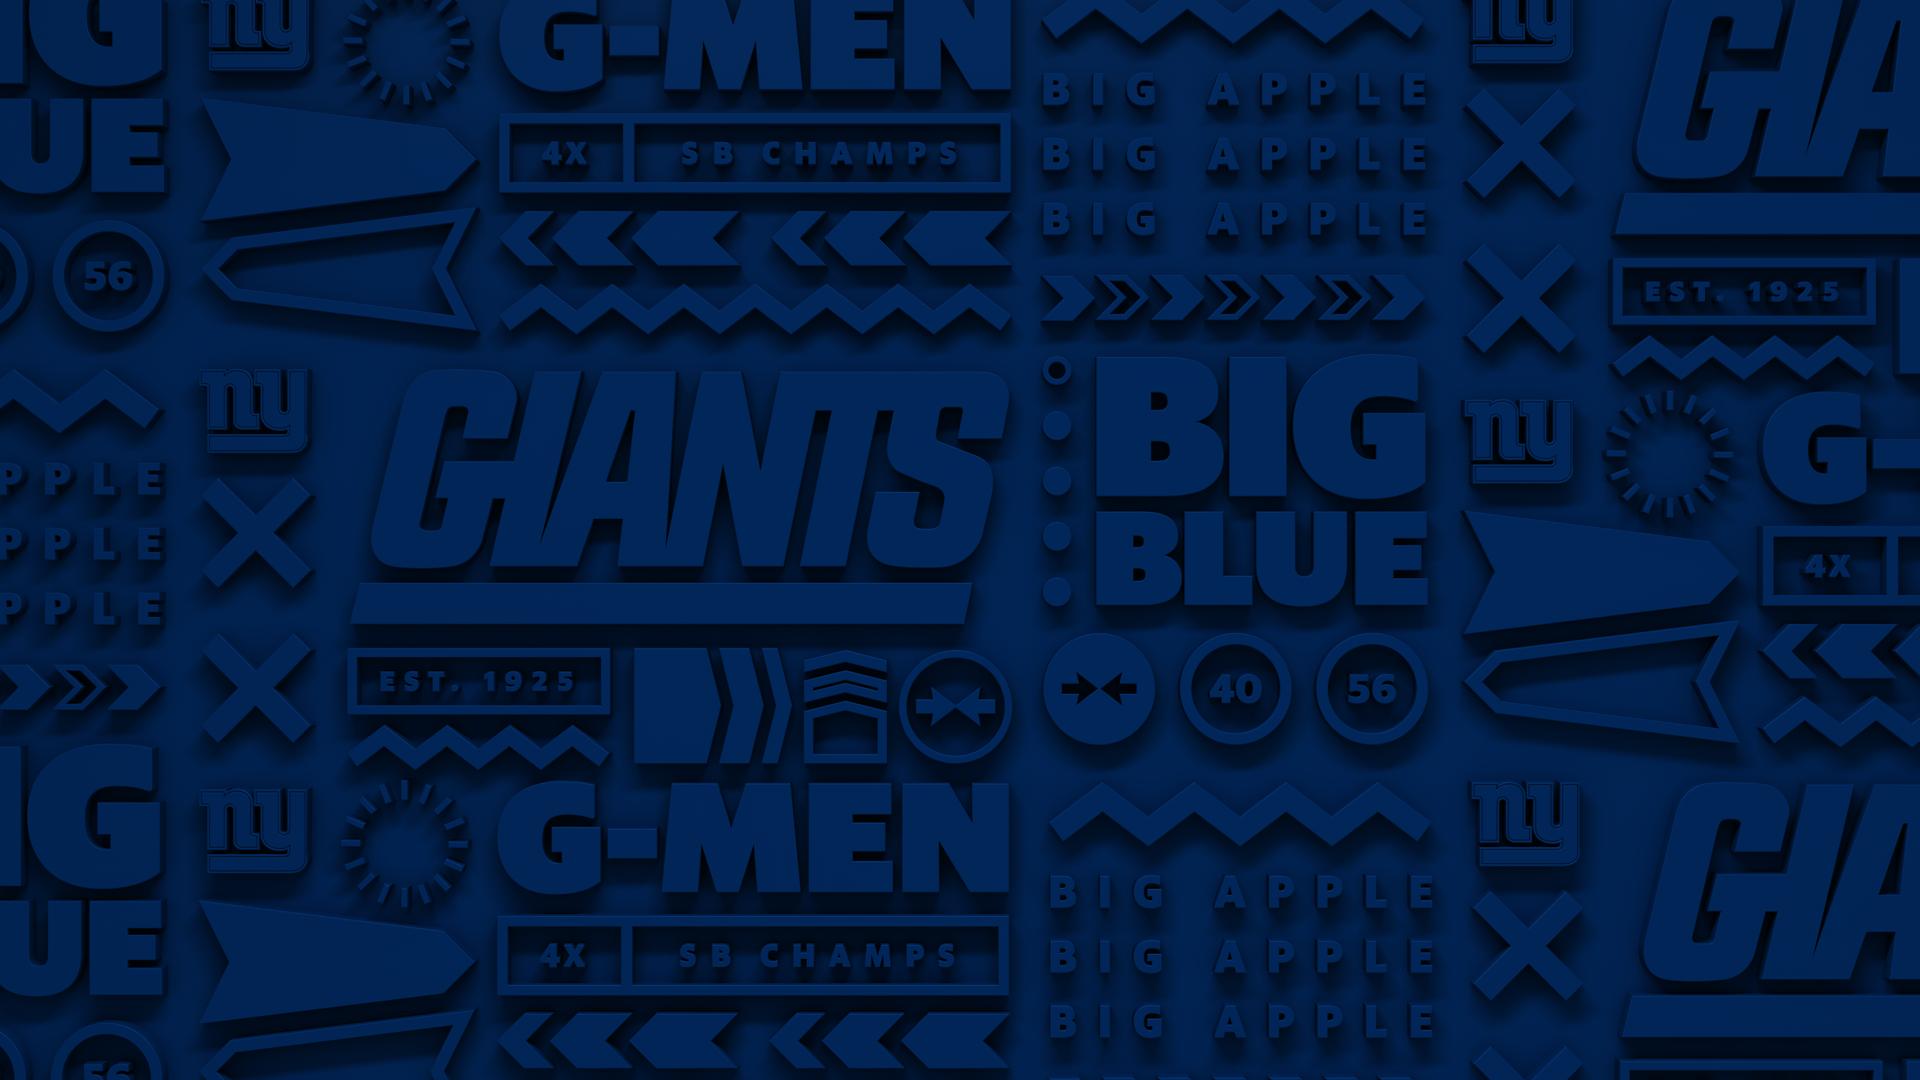 NY_Giants_BKG.png